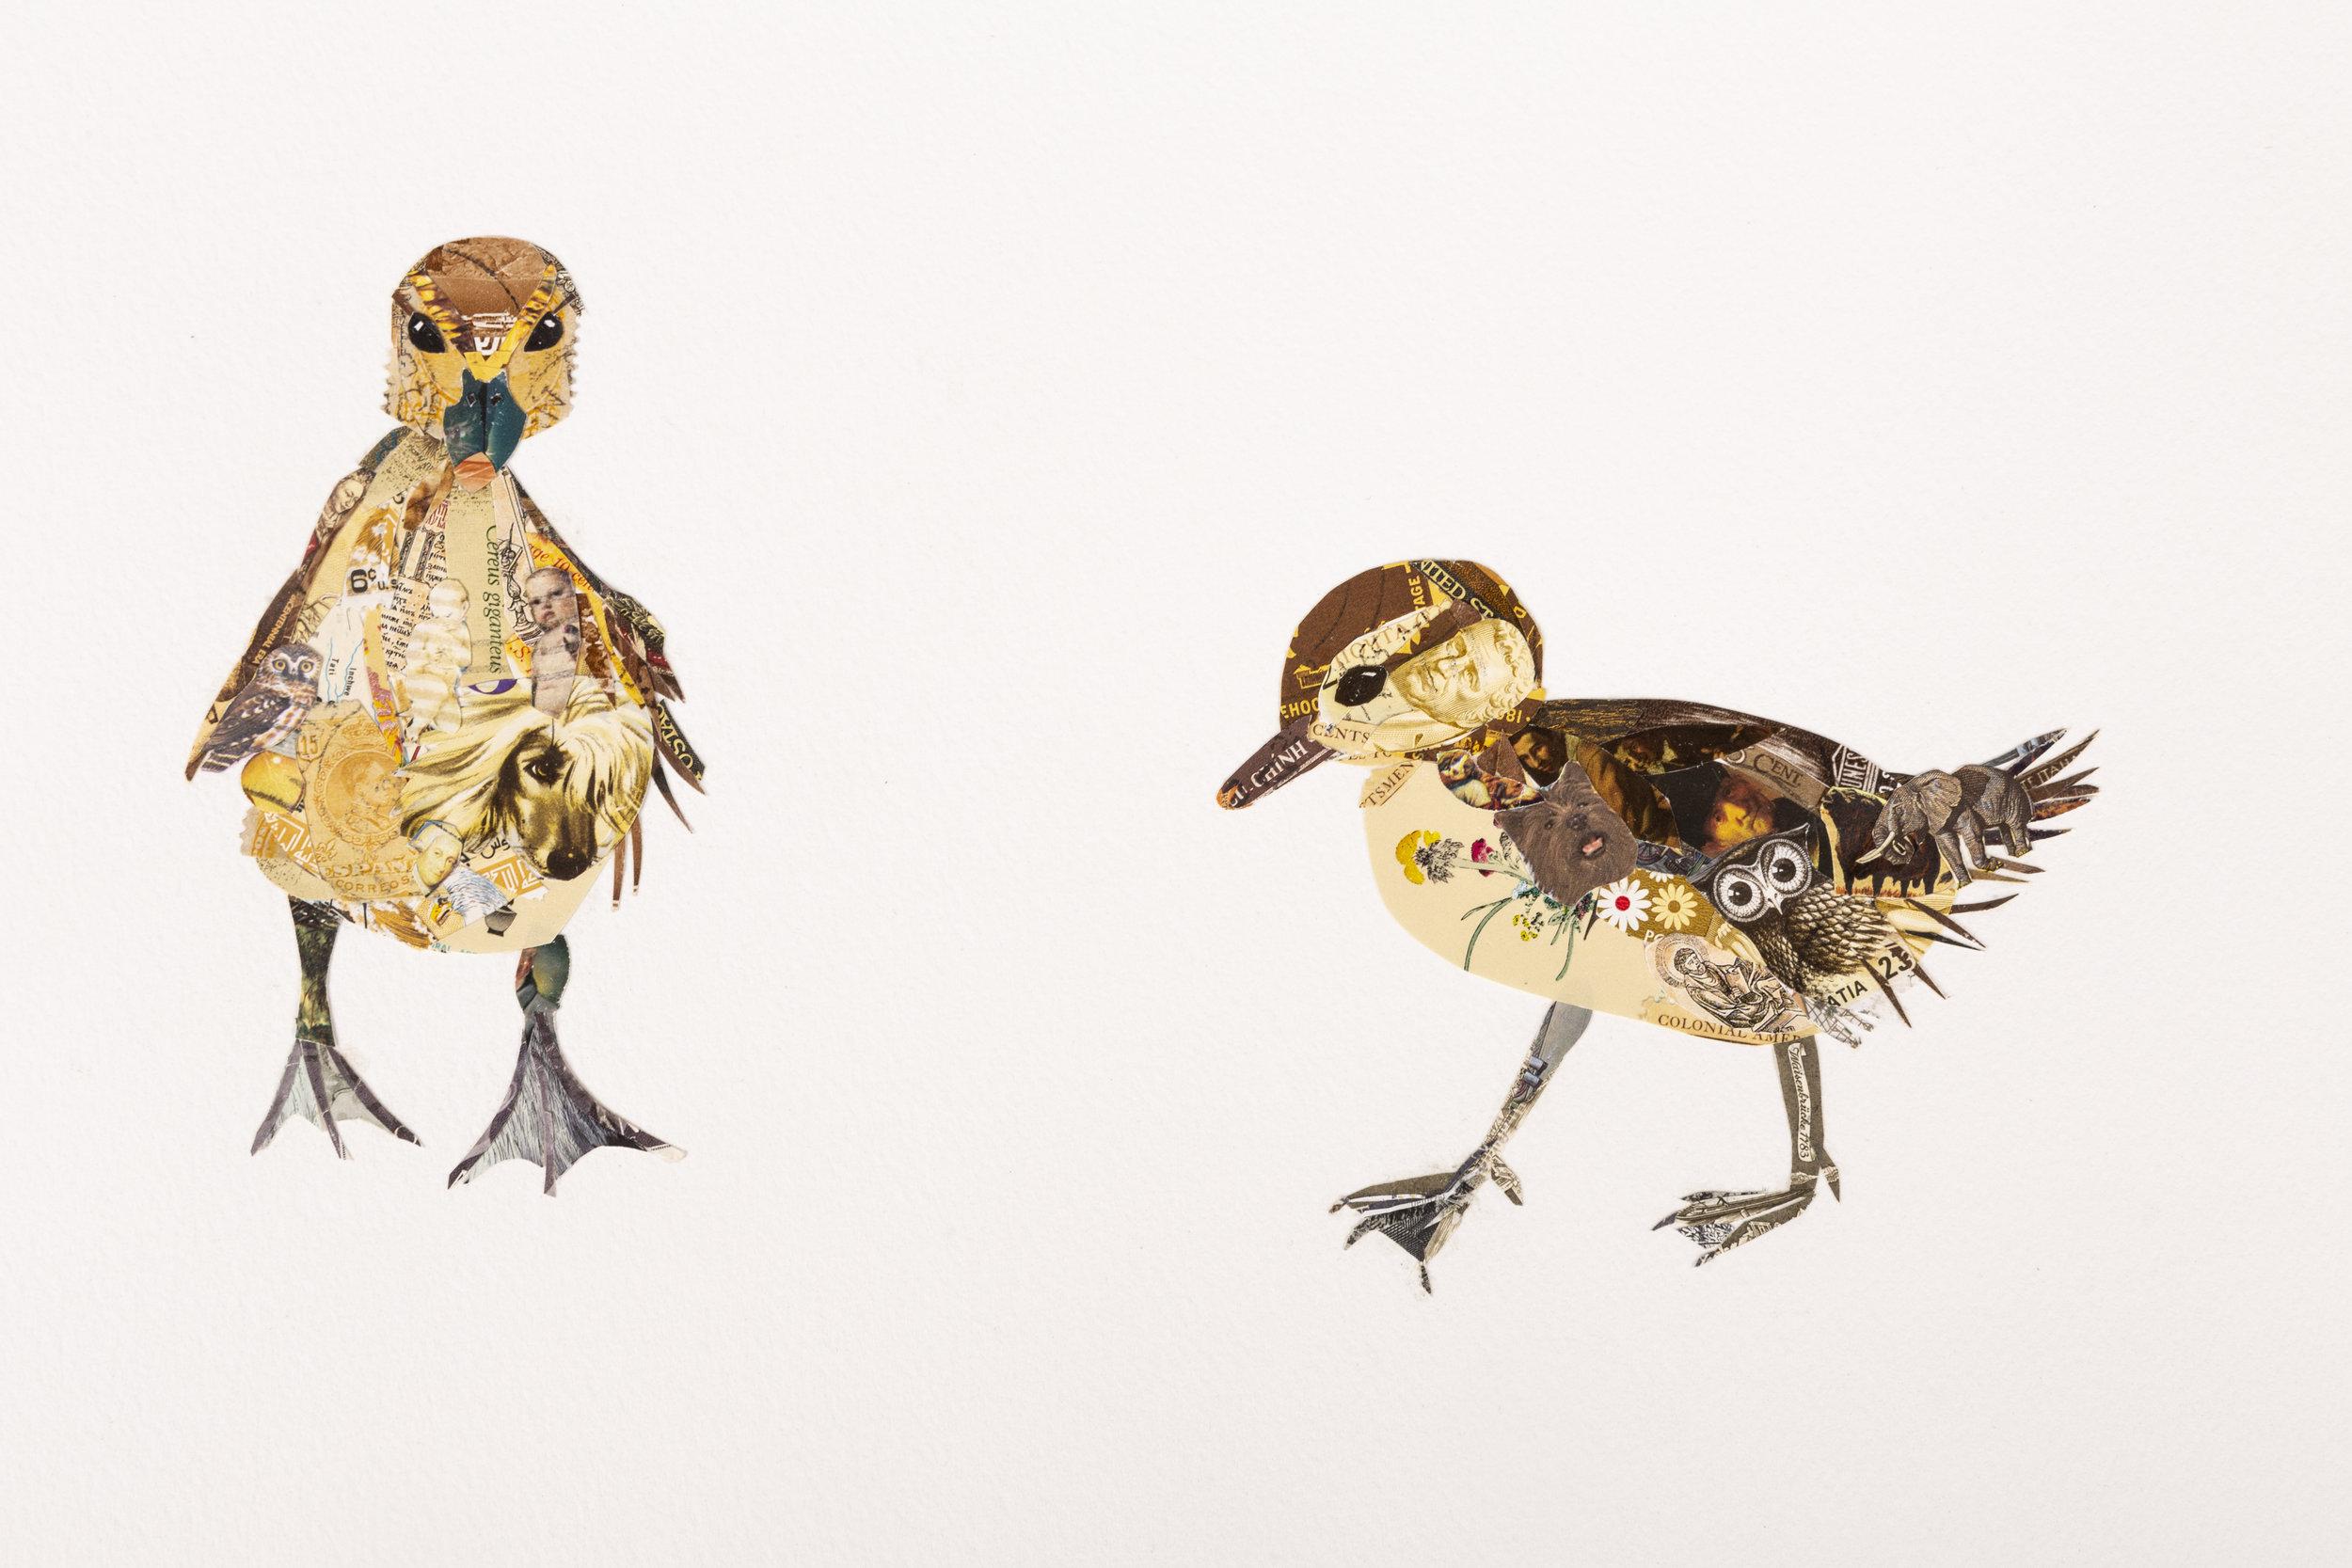 Baby Ducks #1